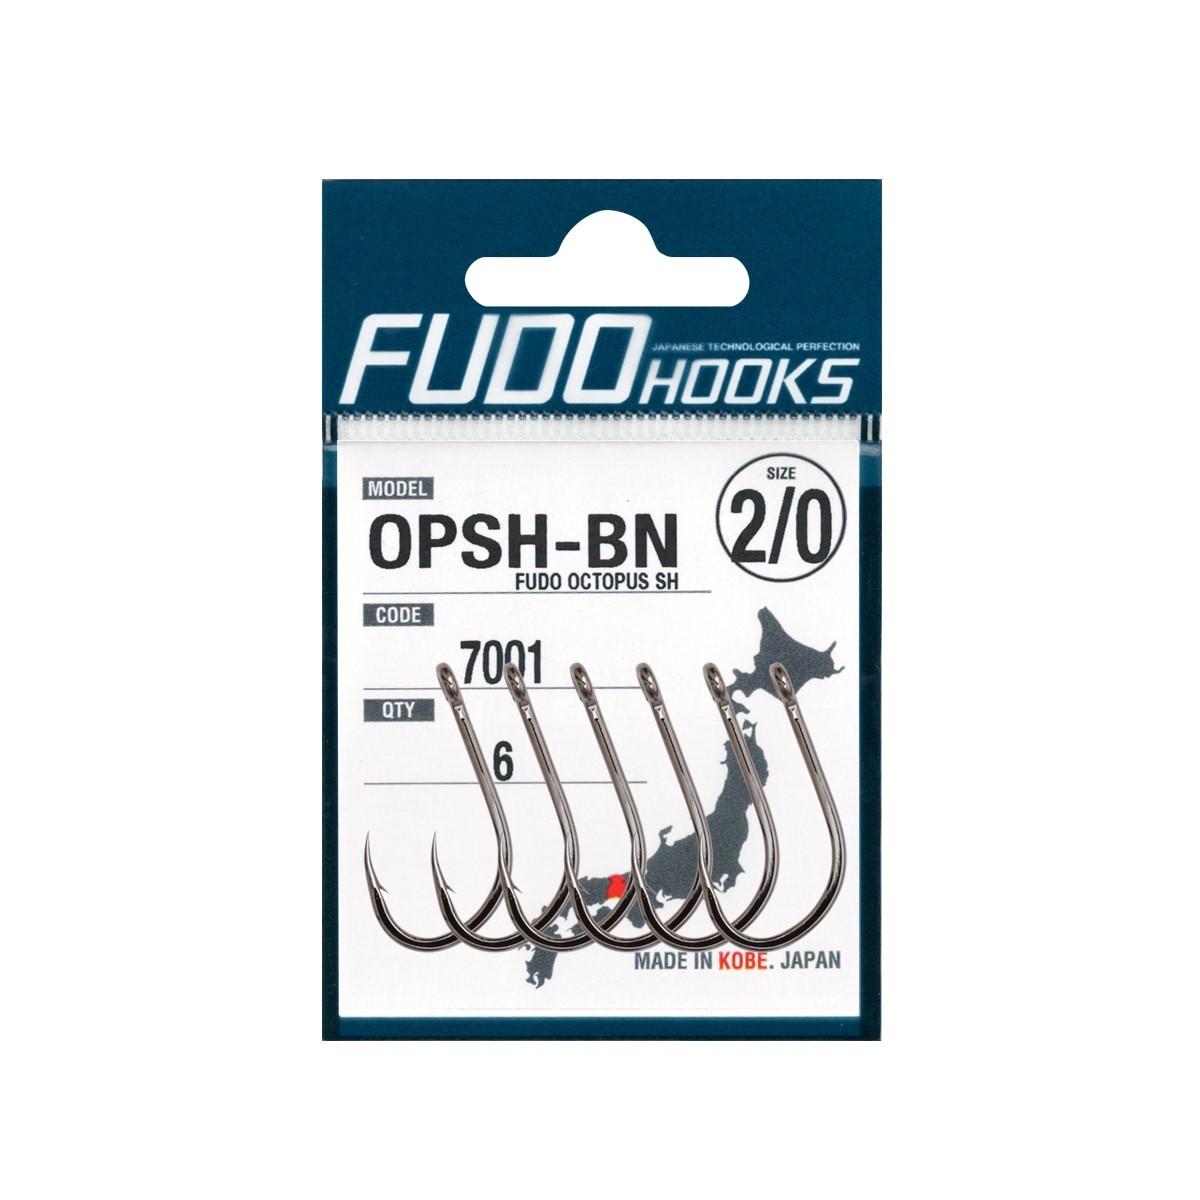 Куки за сом Fudo Octopus OPSH-BN - 7001